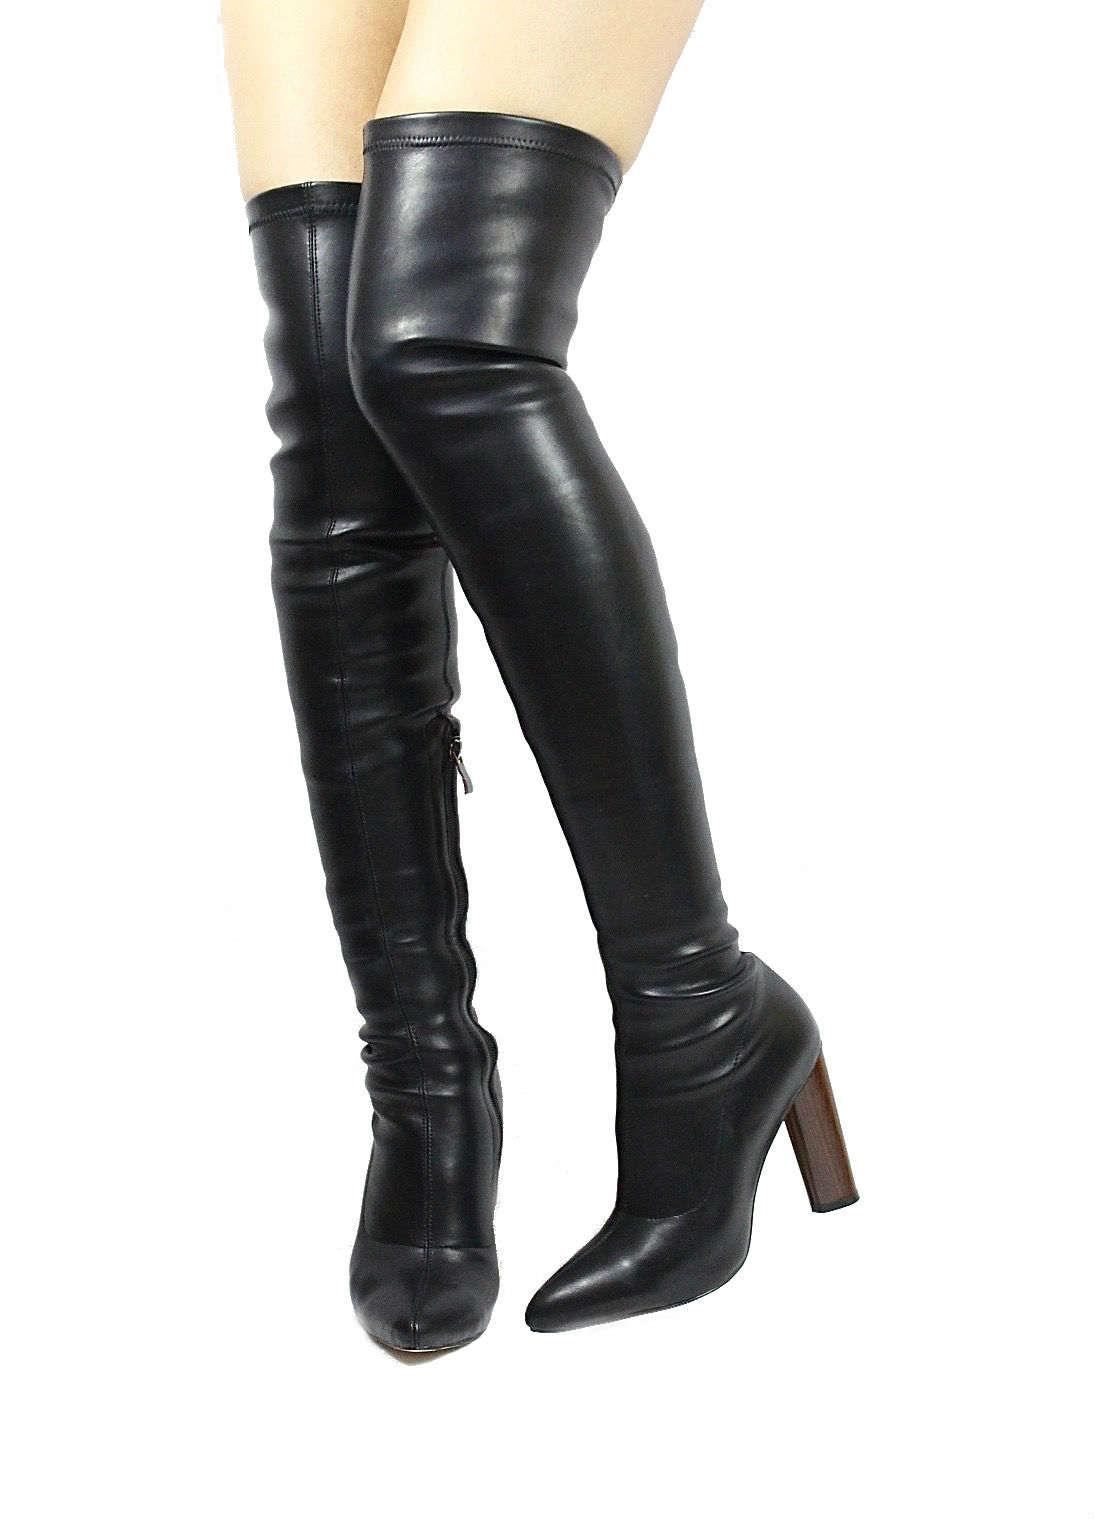 Thigh High Chunky Heel Snug Fit Boots